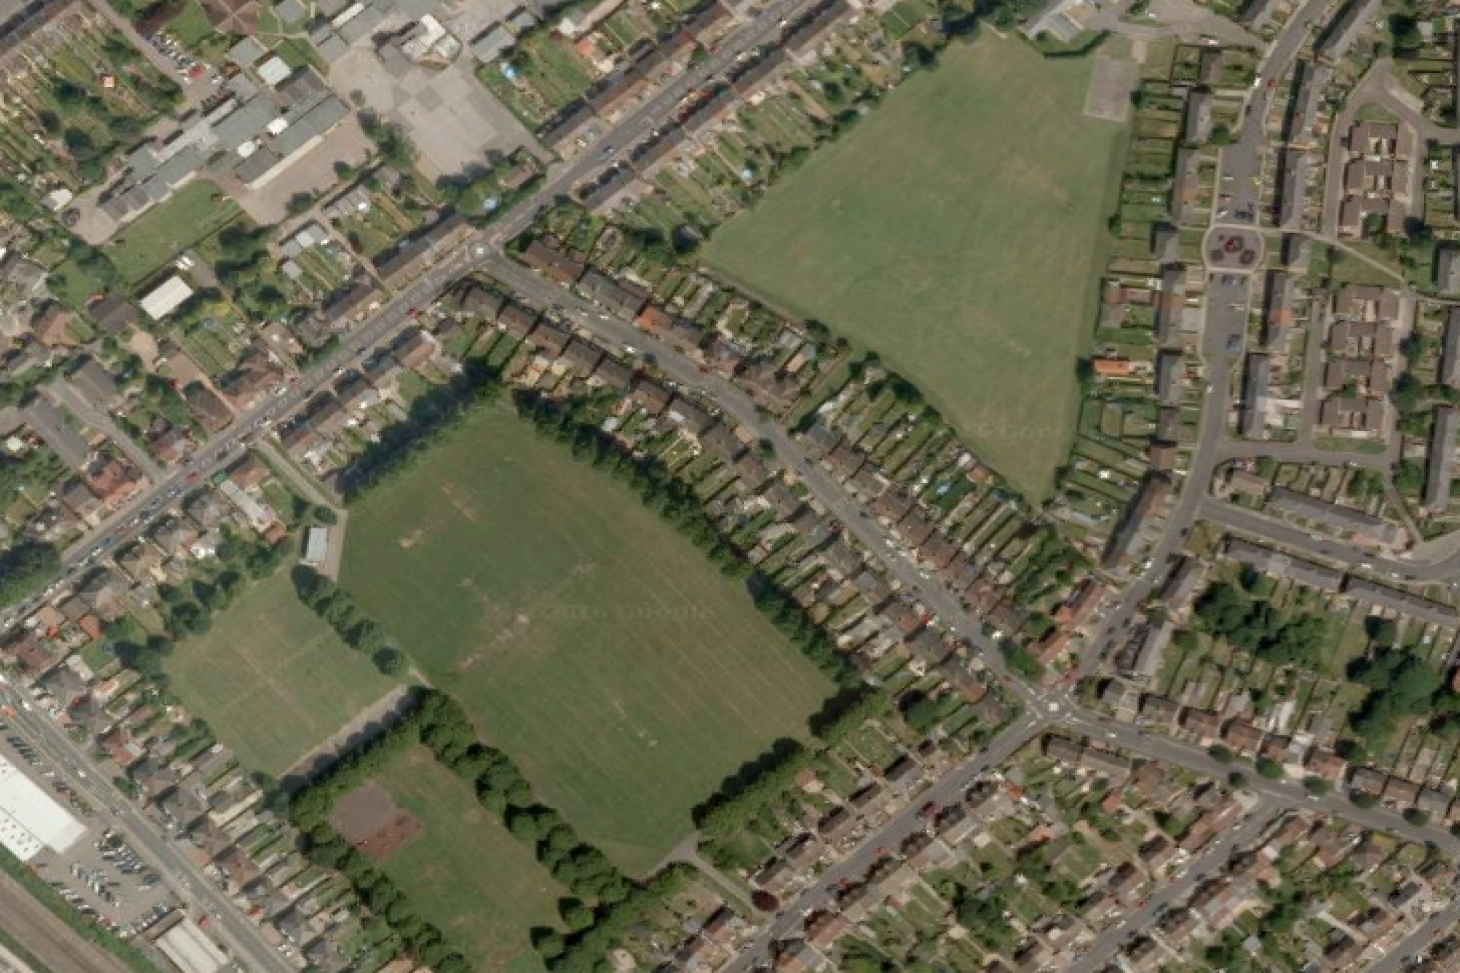 Alder Crescent Recreation Ground 11 a side | Grass football pitch